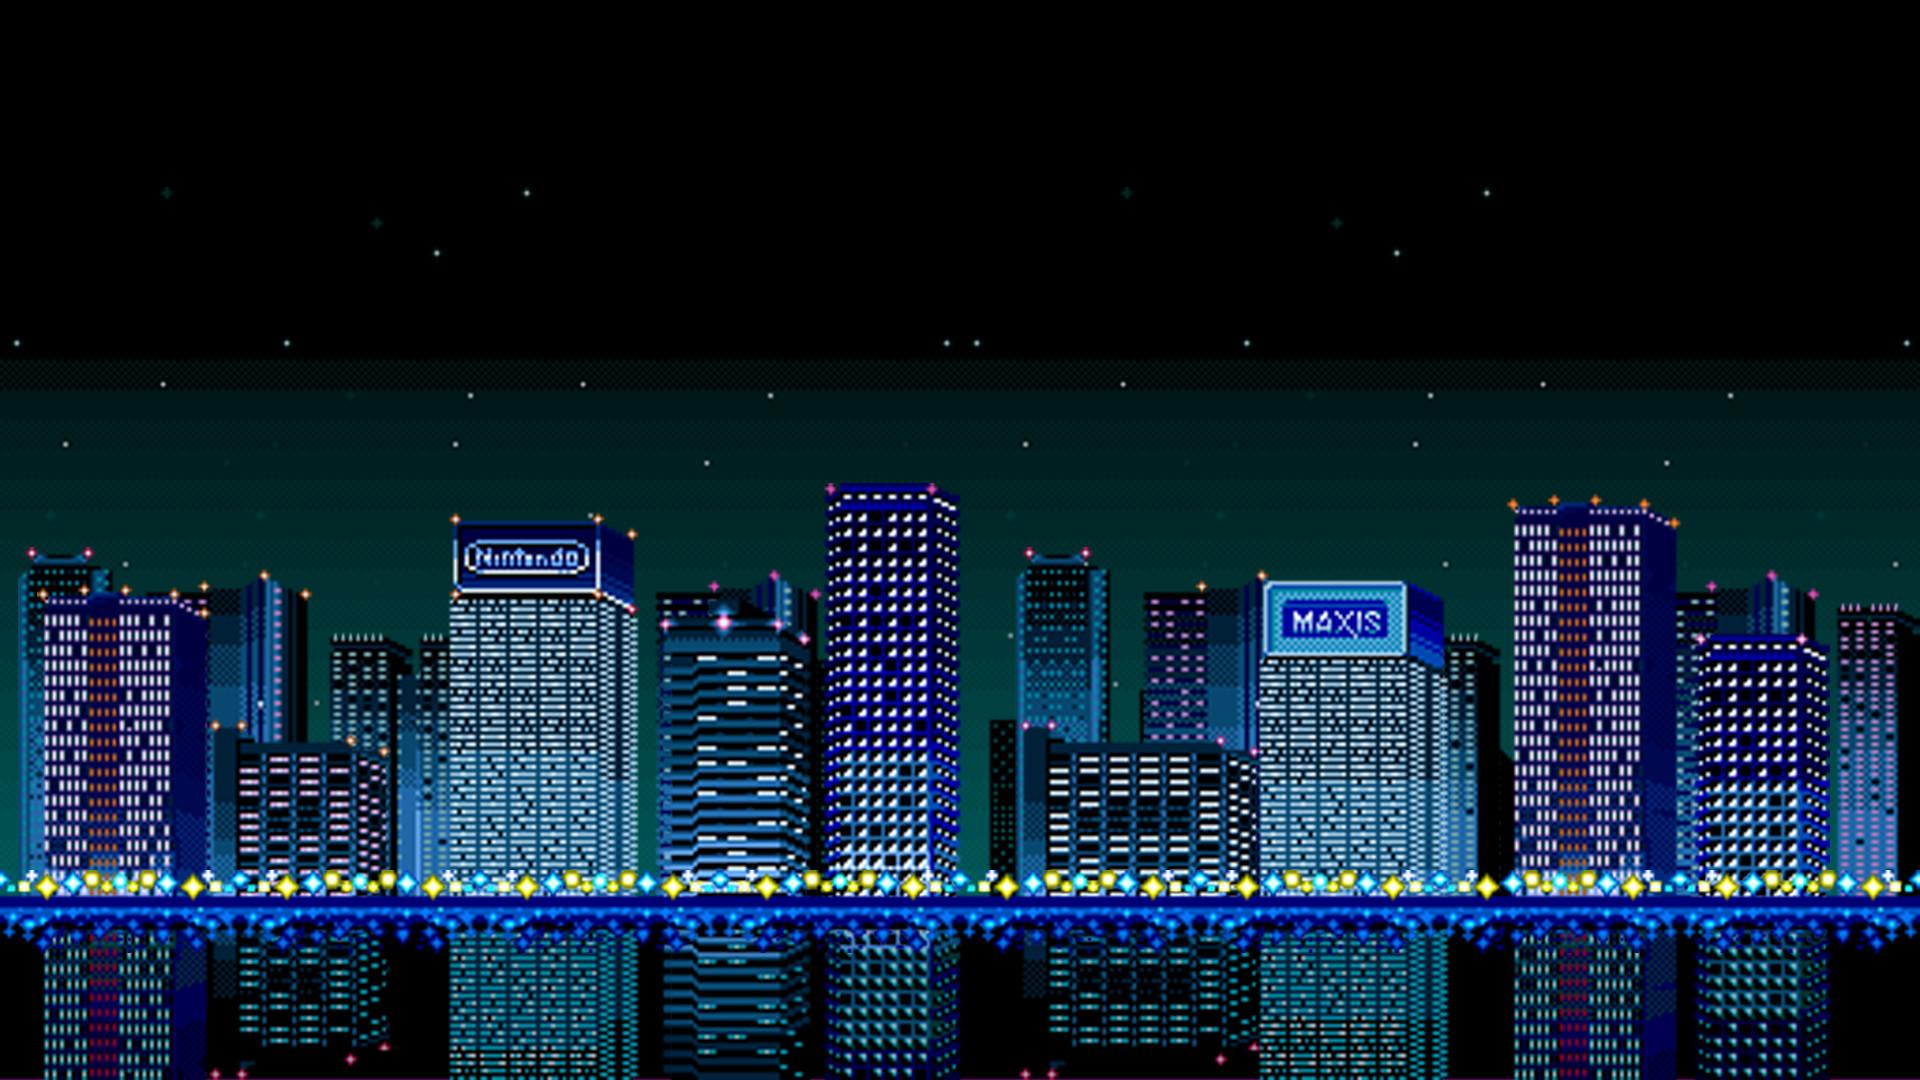 Res: 1920x1080, Super NES SimCity Wallpaper for Your Desktop